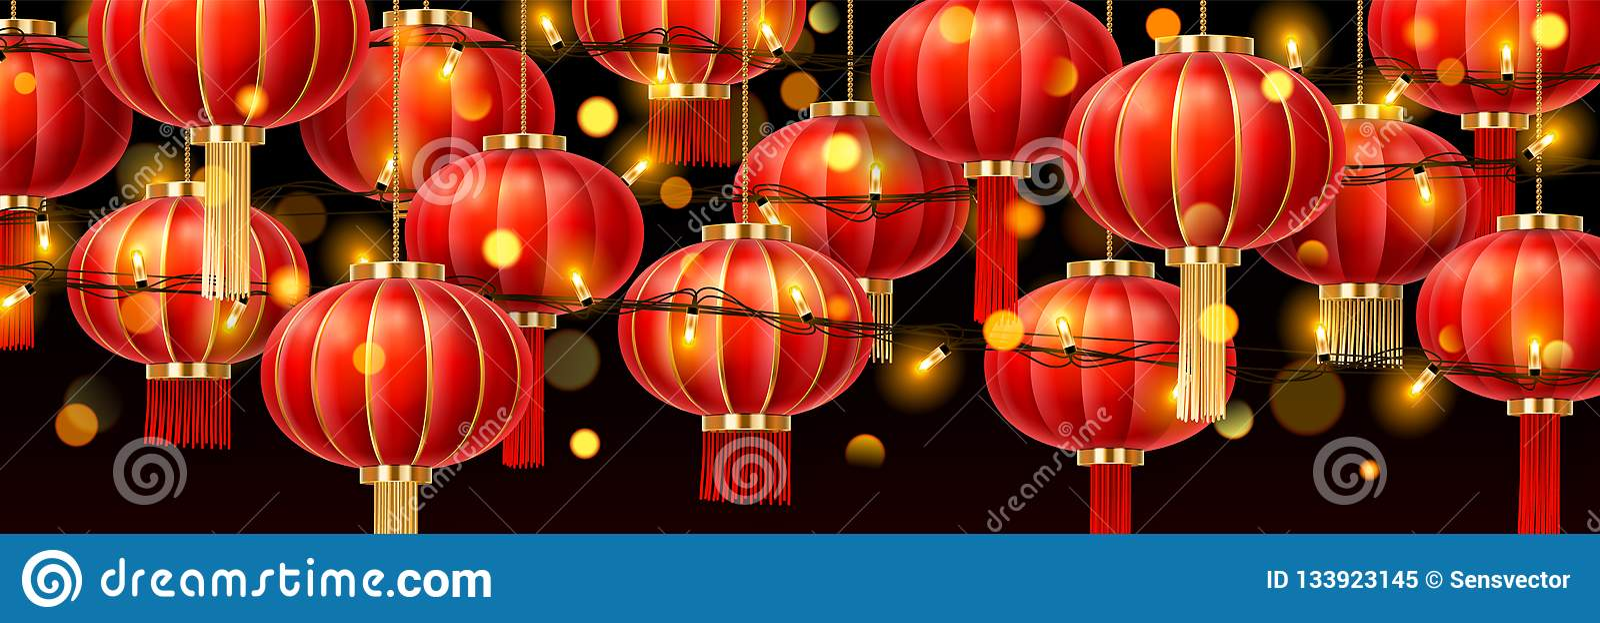 Lampade Cinesi Di Carta.Ghirlande Sulle Lanterne Cinesi O Sulle Lampade Di Carta